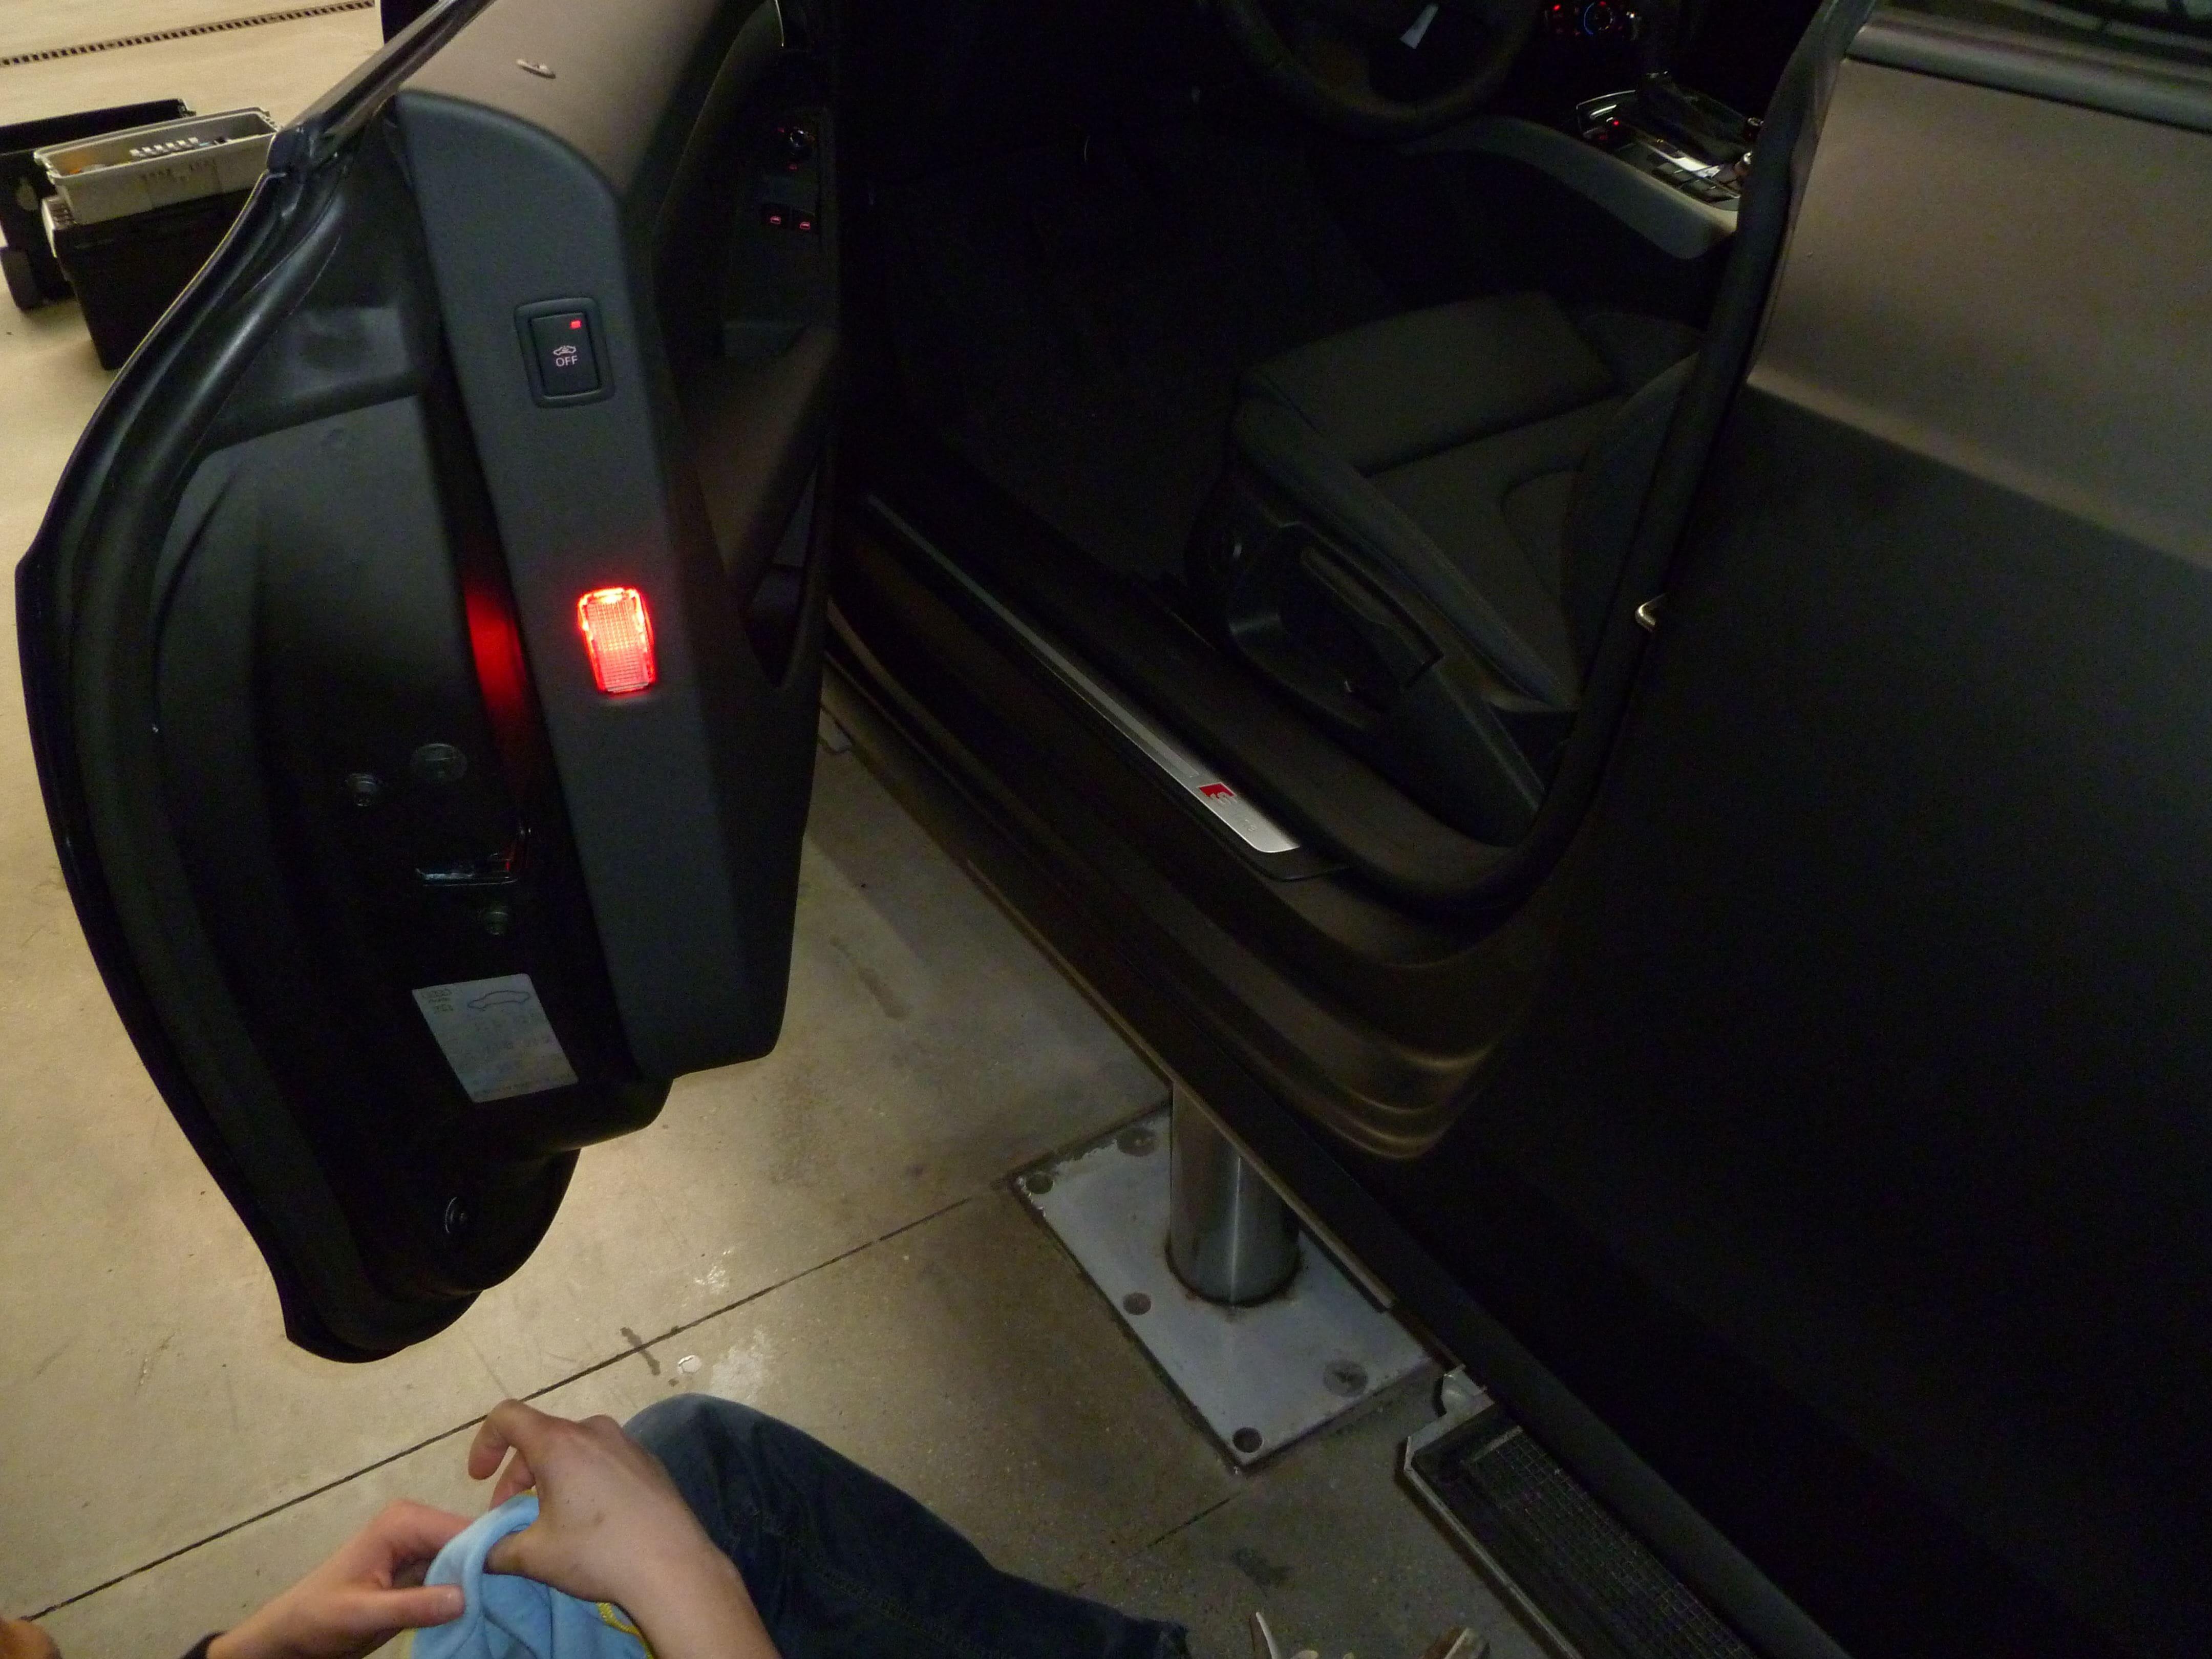 Audi A5 Coupe met Mat Zwarte Wrap, Carwrapping door Wrapmyride.nu Foto-nr:4655, ©2021